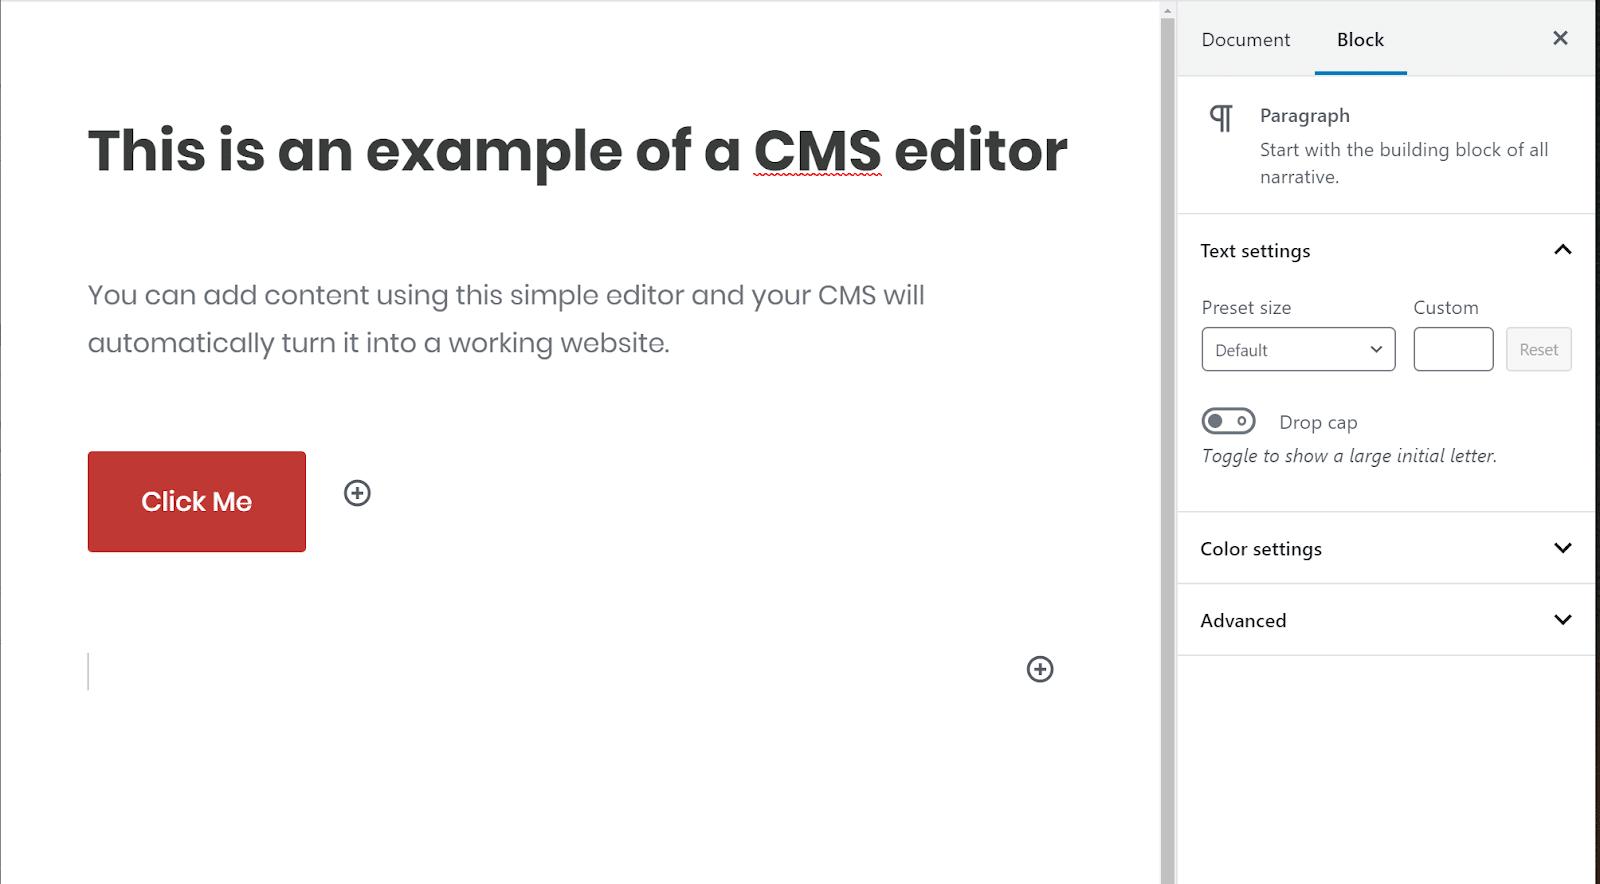 cms editor example